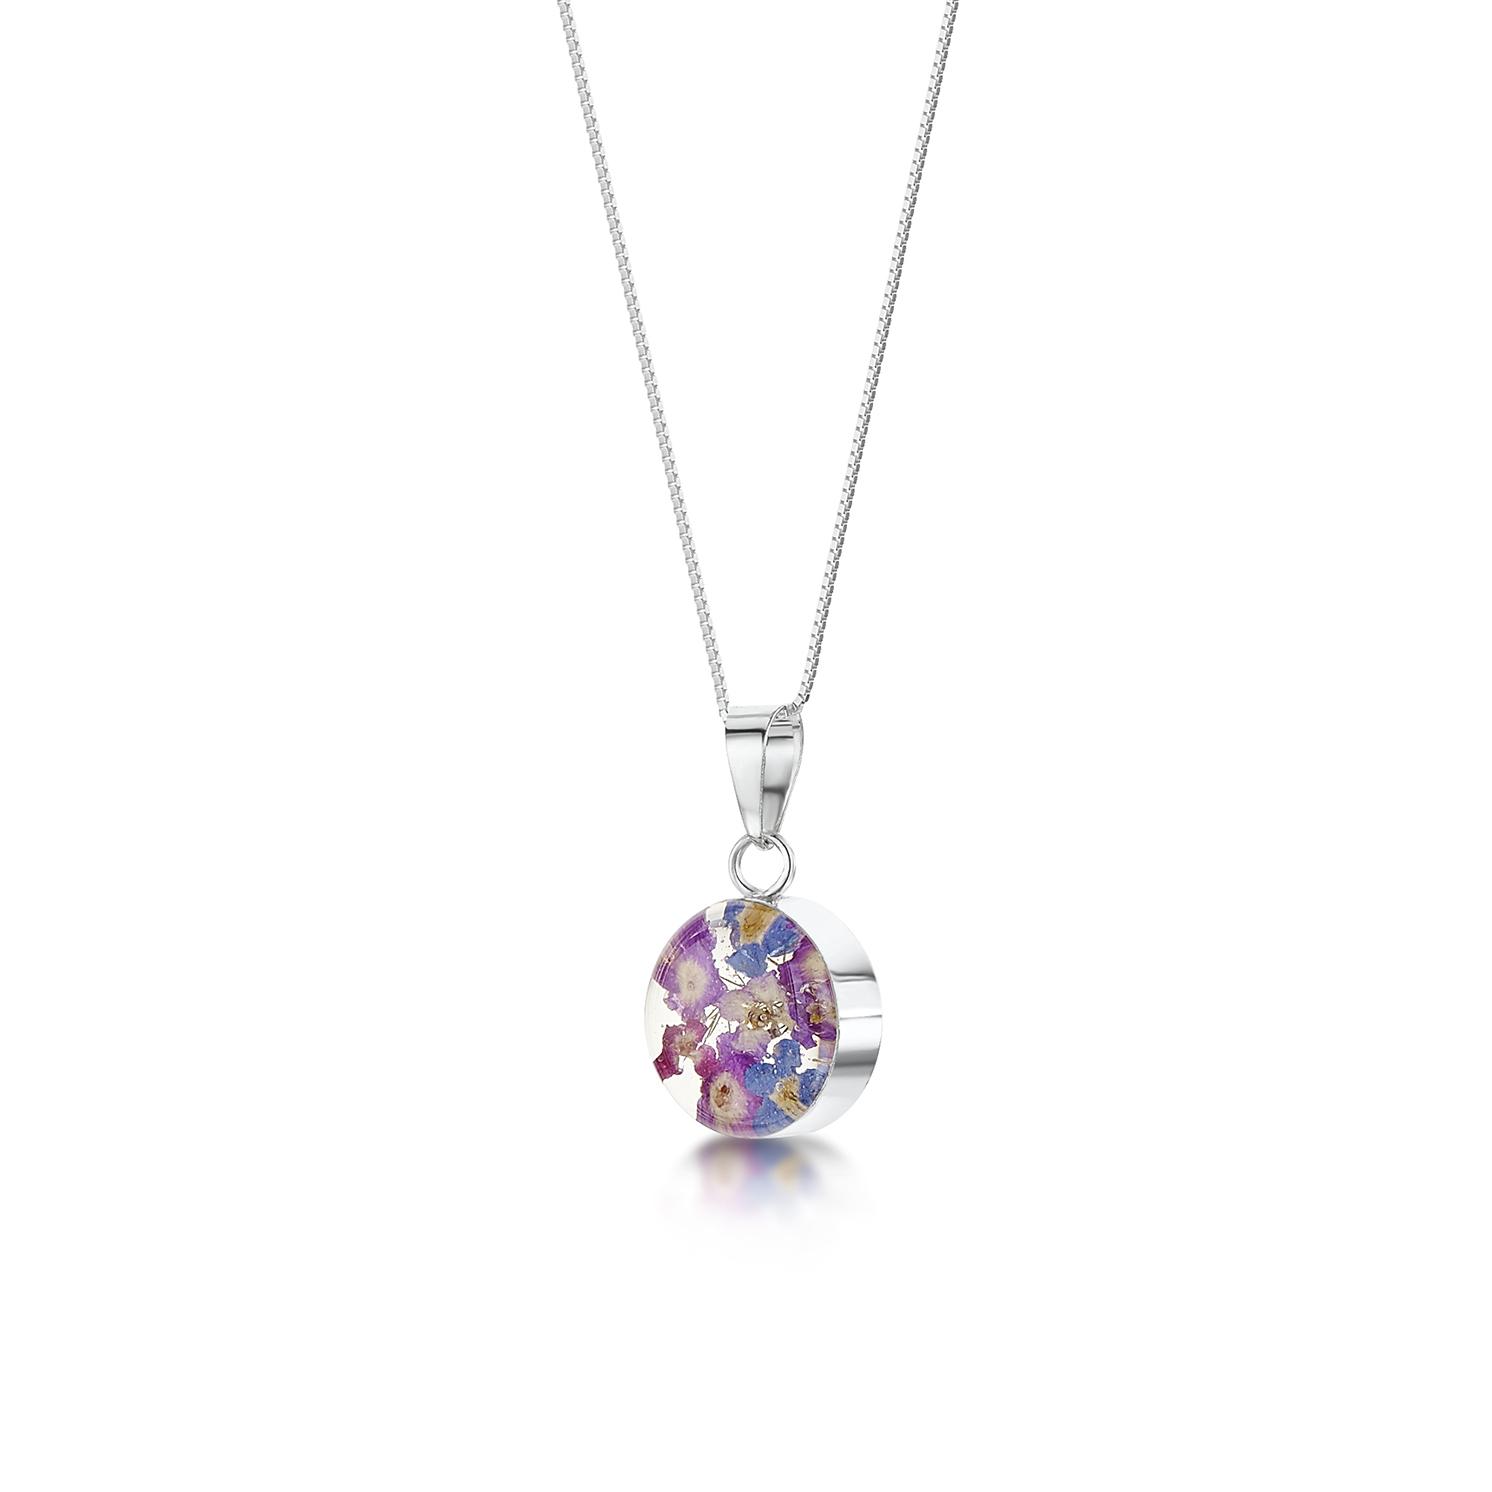 Shrieking Violet – Purple Haze Silver Round Pendant Necklace in Gift Box